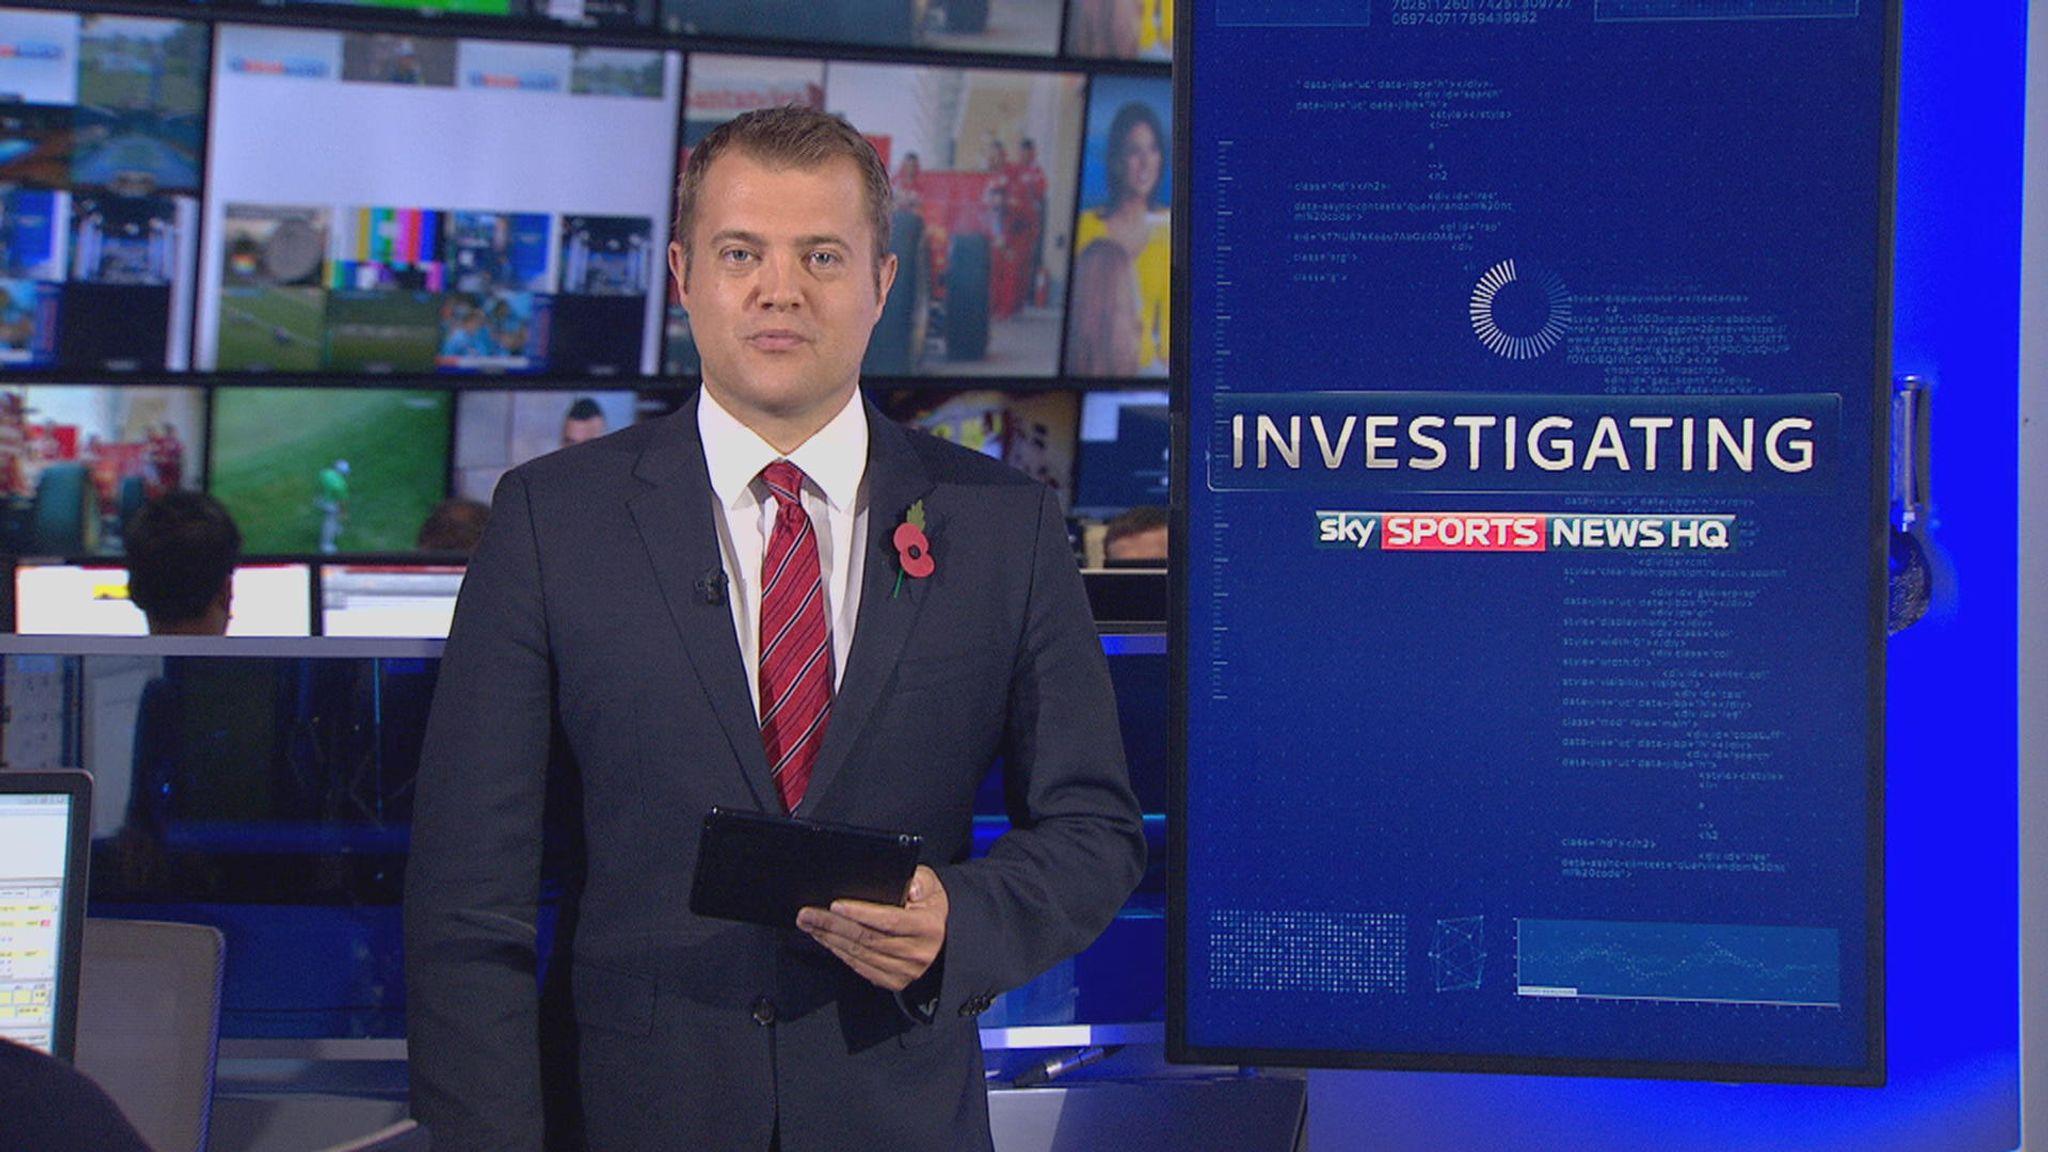 Sky Sports News: Latest headlines from the Investigations desk   News News    Sky Sports